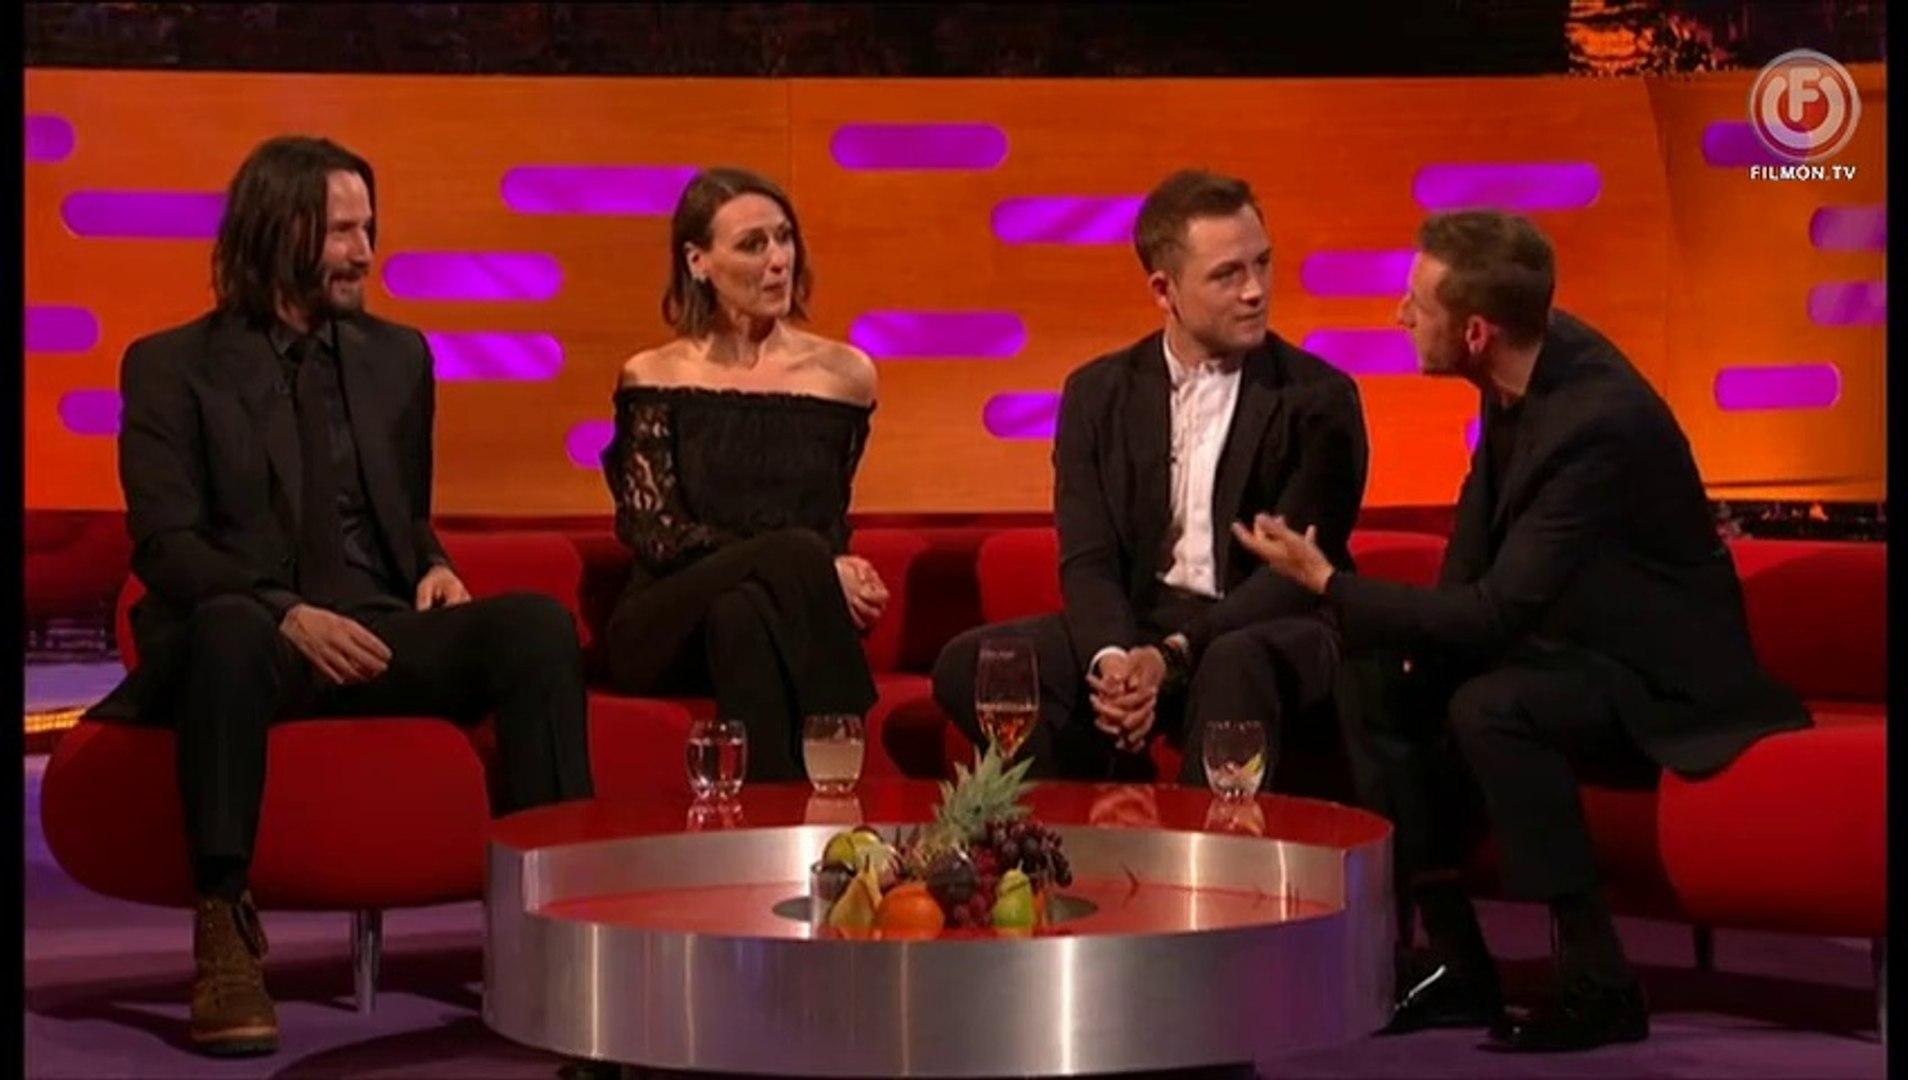 The Graham Norton Show S25e05 Keanu Reeves Kylie Minogue Taron Egerton Jamie Bell Suranne Jones Michael Rice May 03 2019